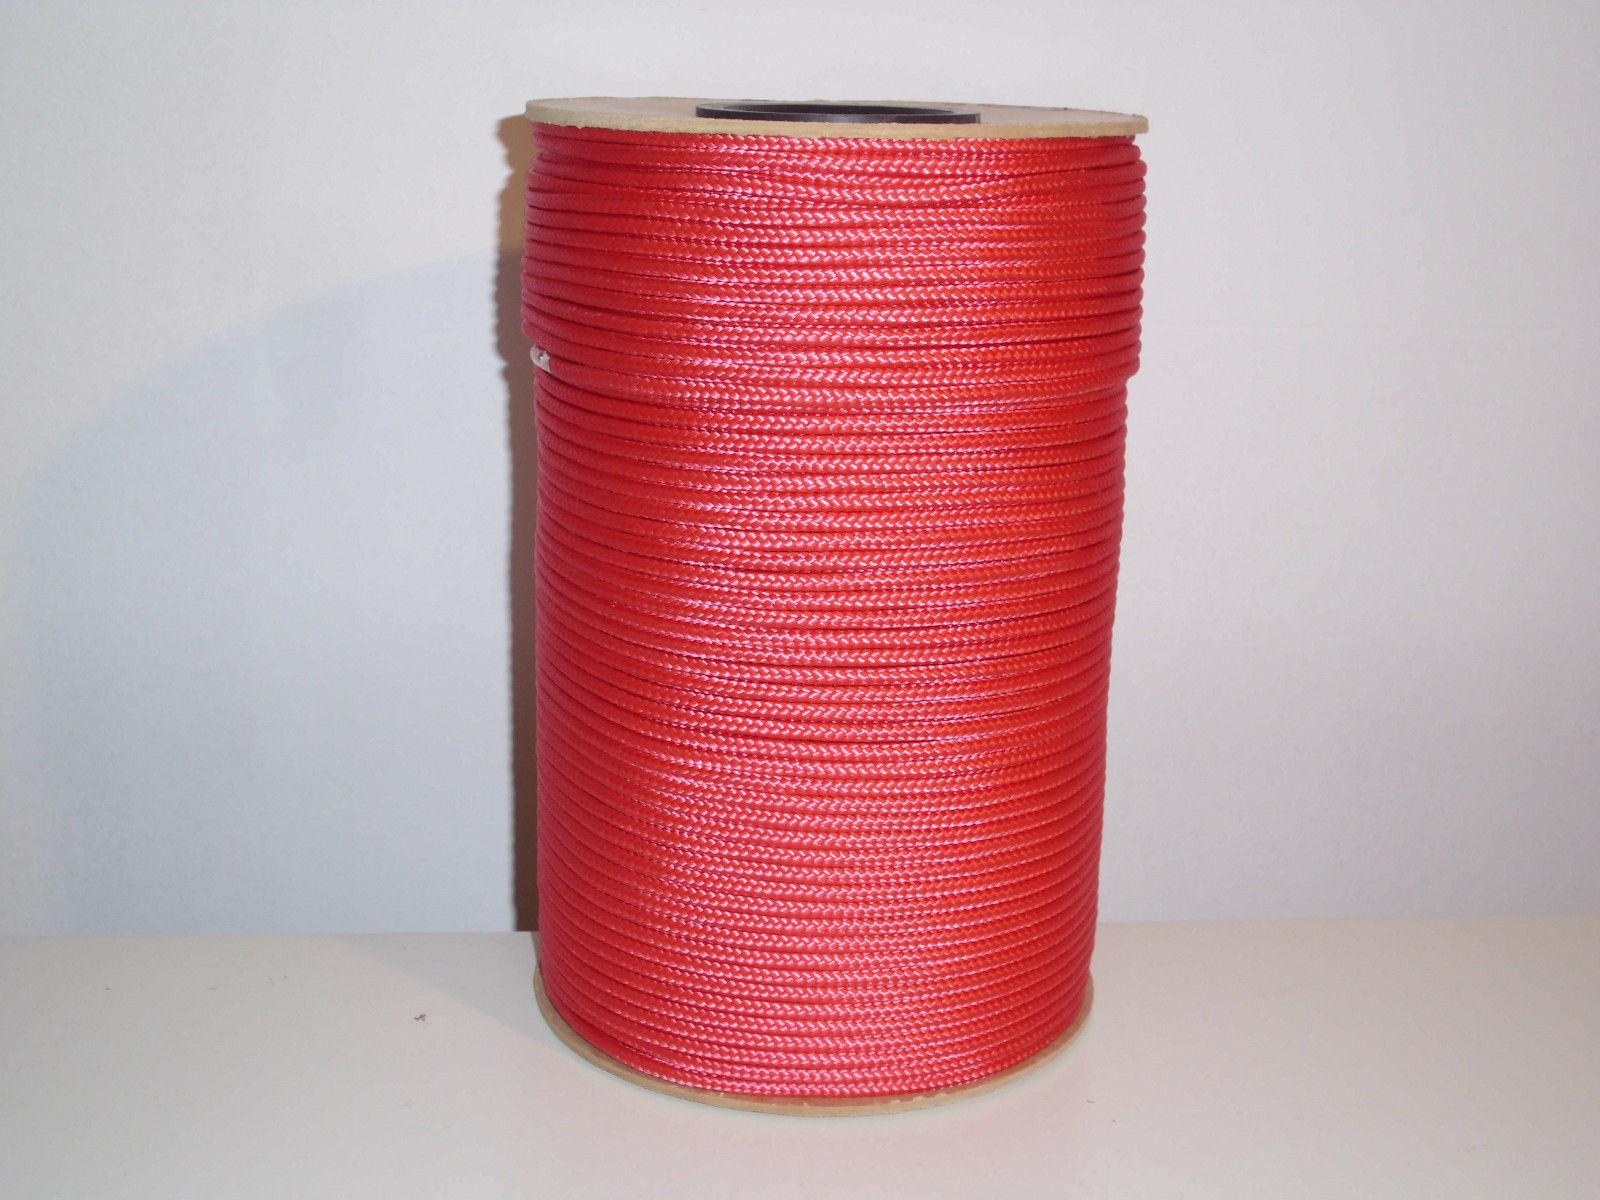 8mm 0,50- /m Paracord Polypropylen Seil Schnur Kunststoff Leine Reepschnur Paracord /m a1756f